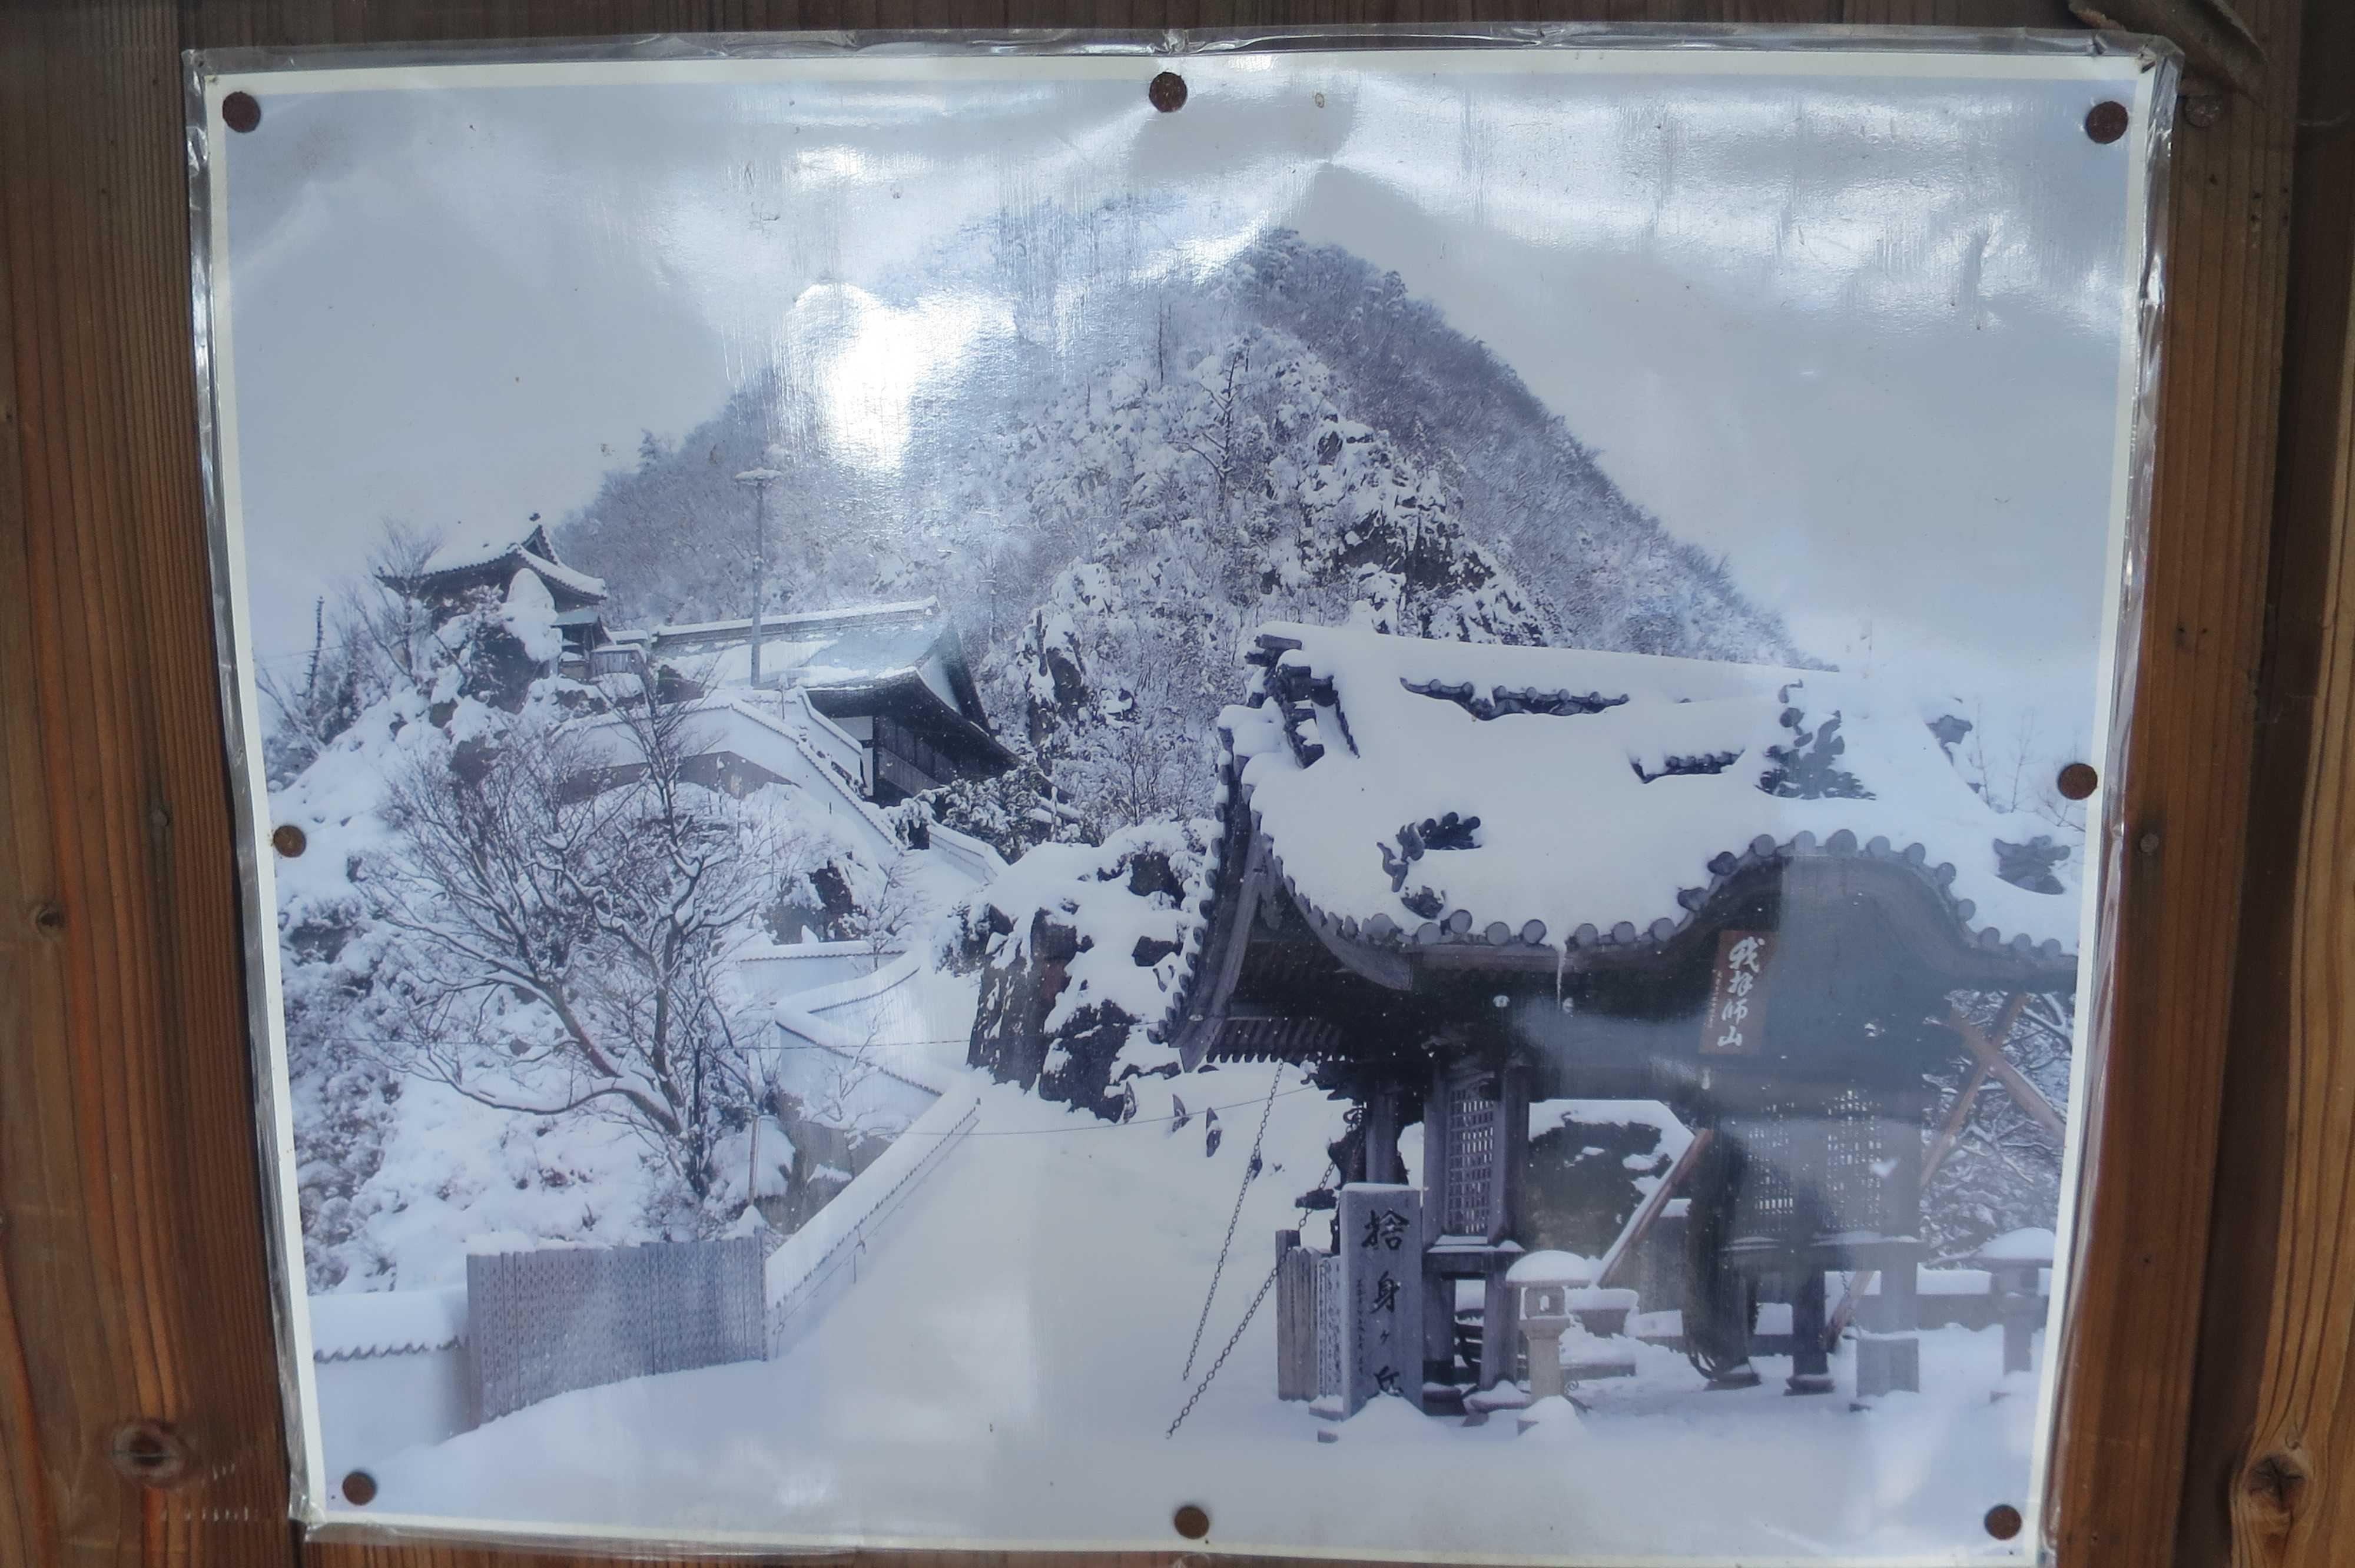 捨身ヶ嶽禅定の雪景色写真